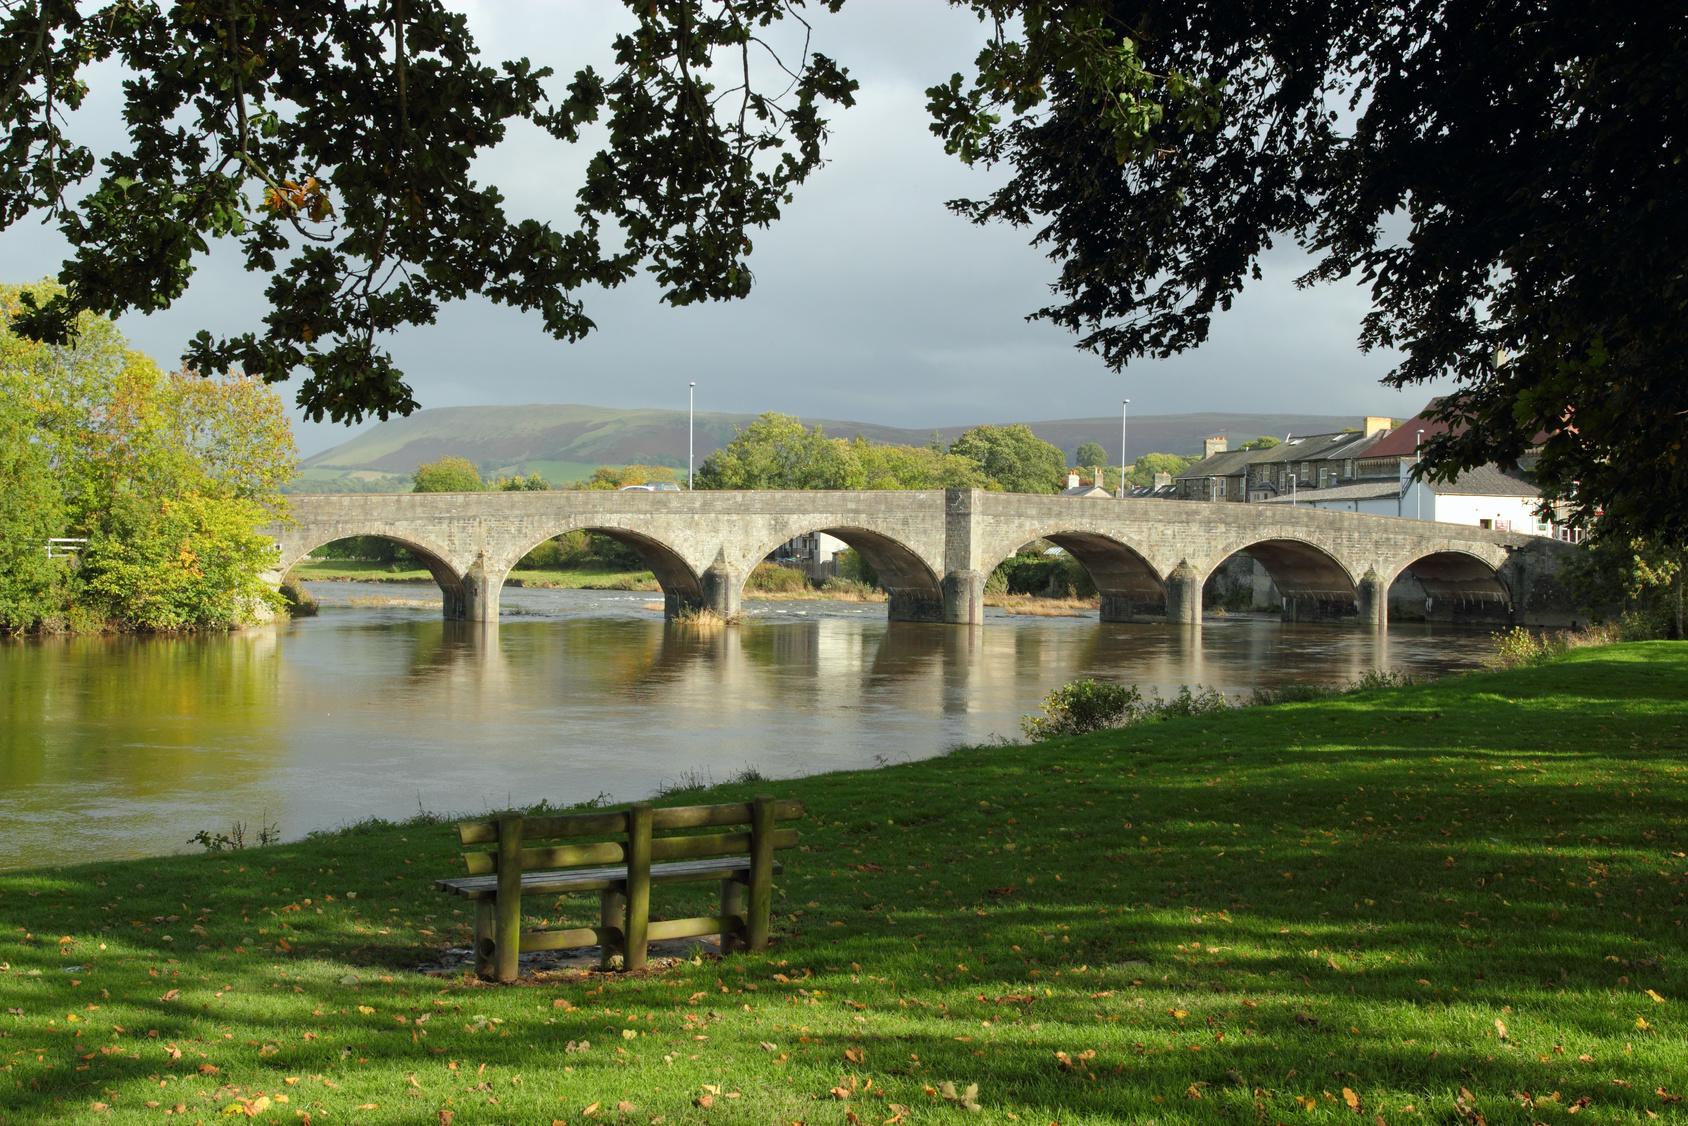 The famous Wye Bridge, Builth Wells